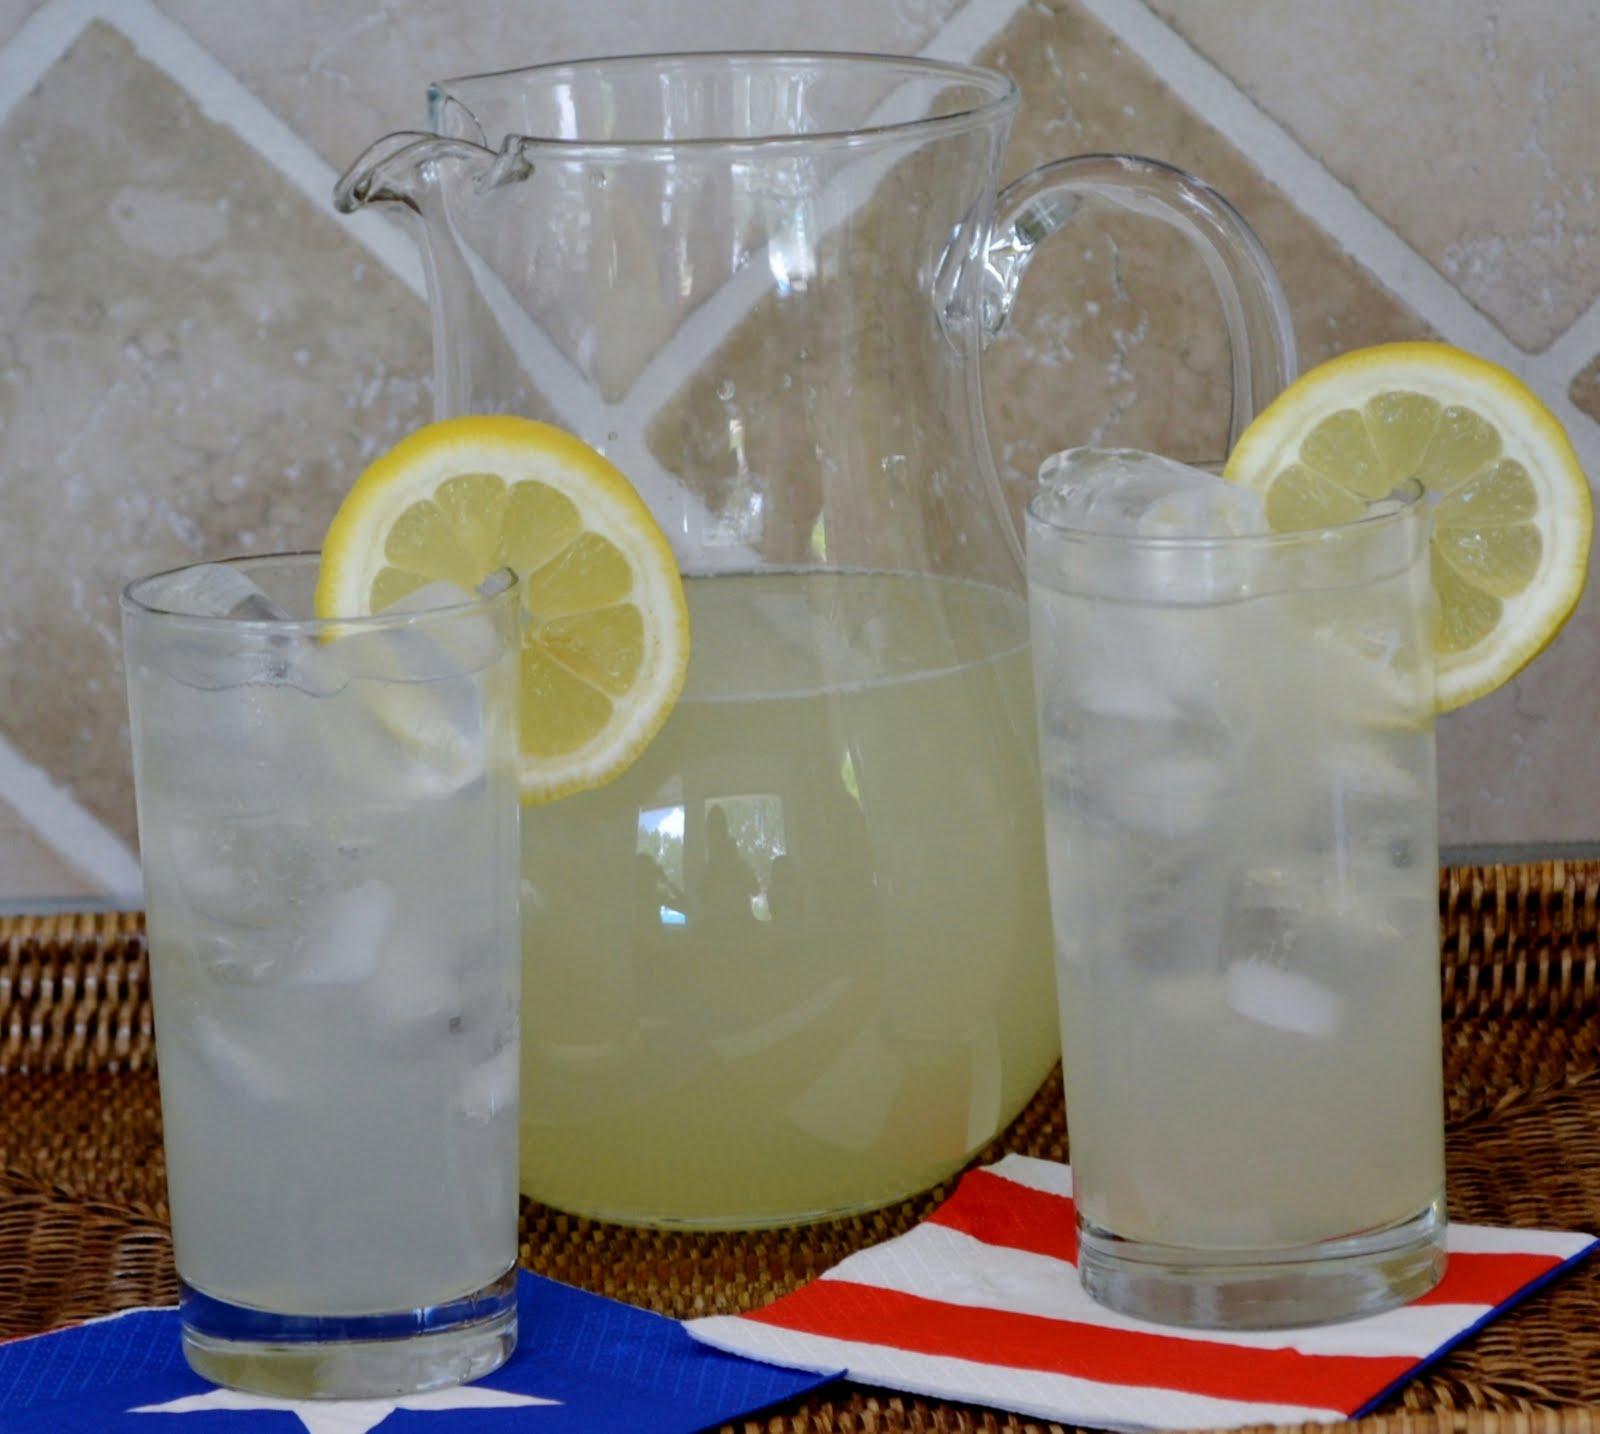 Sunflower Supper Club: A Perfect Glass of Lemonade